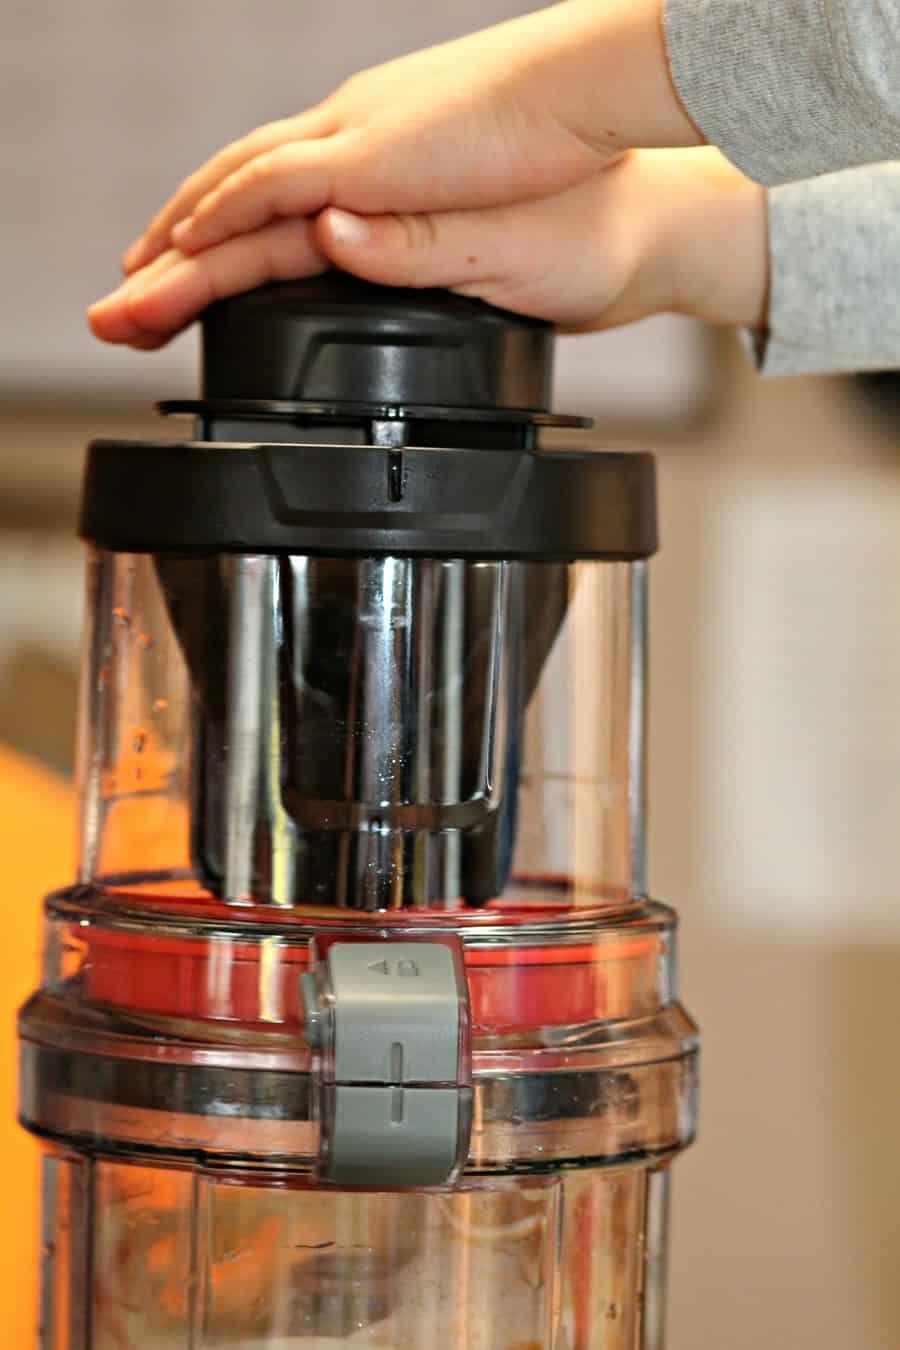 Ninja® Intelli-Sense™ Kitchen System with Auto-Spiralizer™